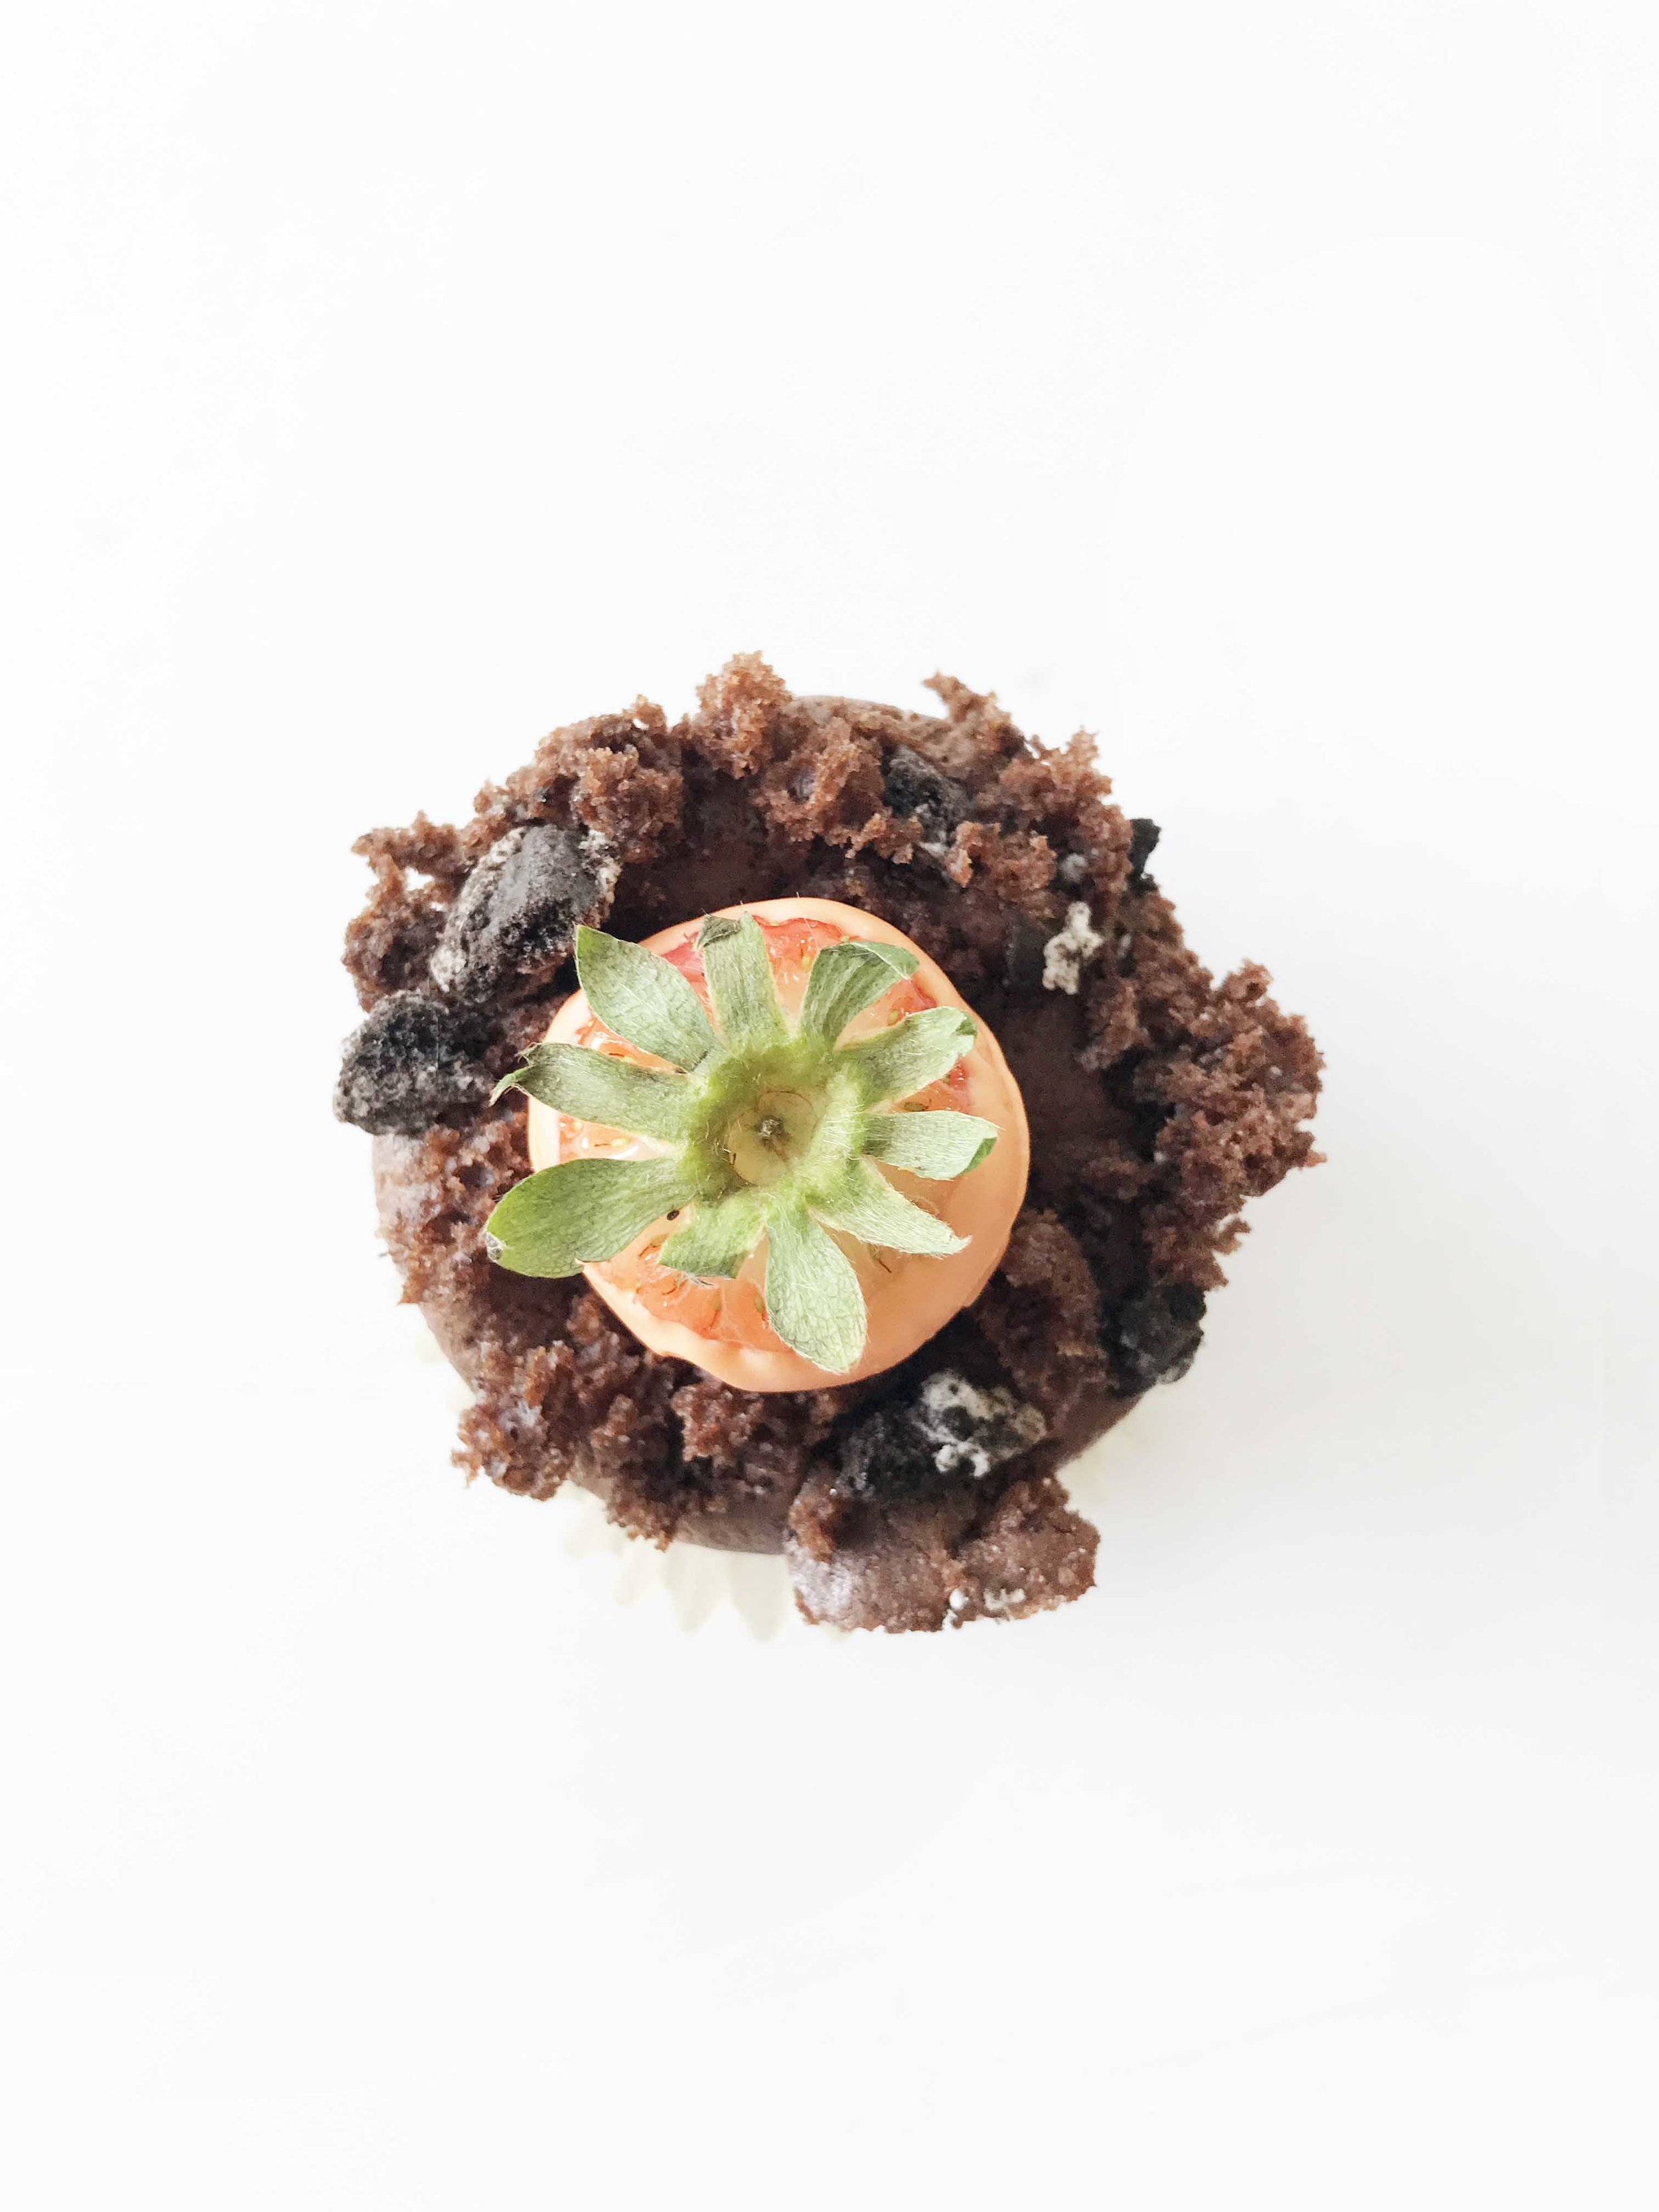 carrot-patch-cupcakes13.jpg